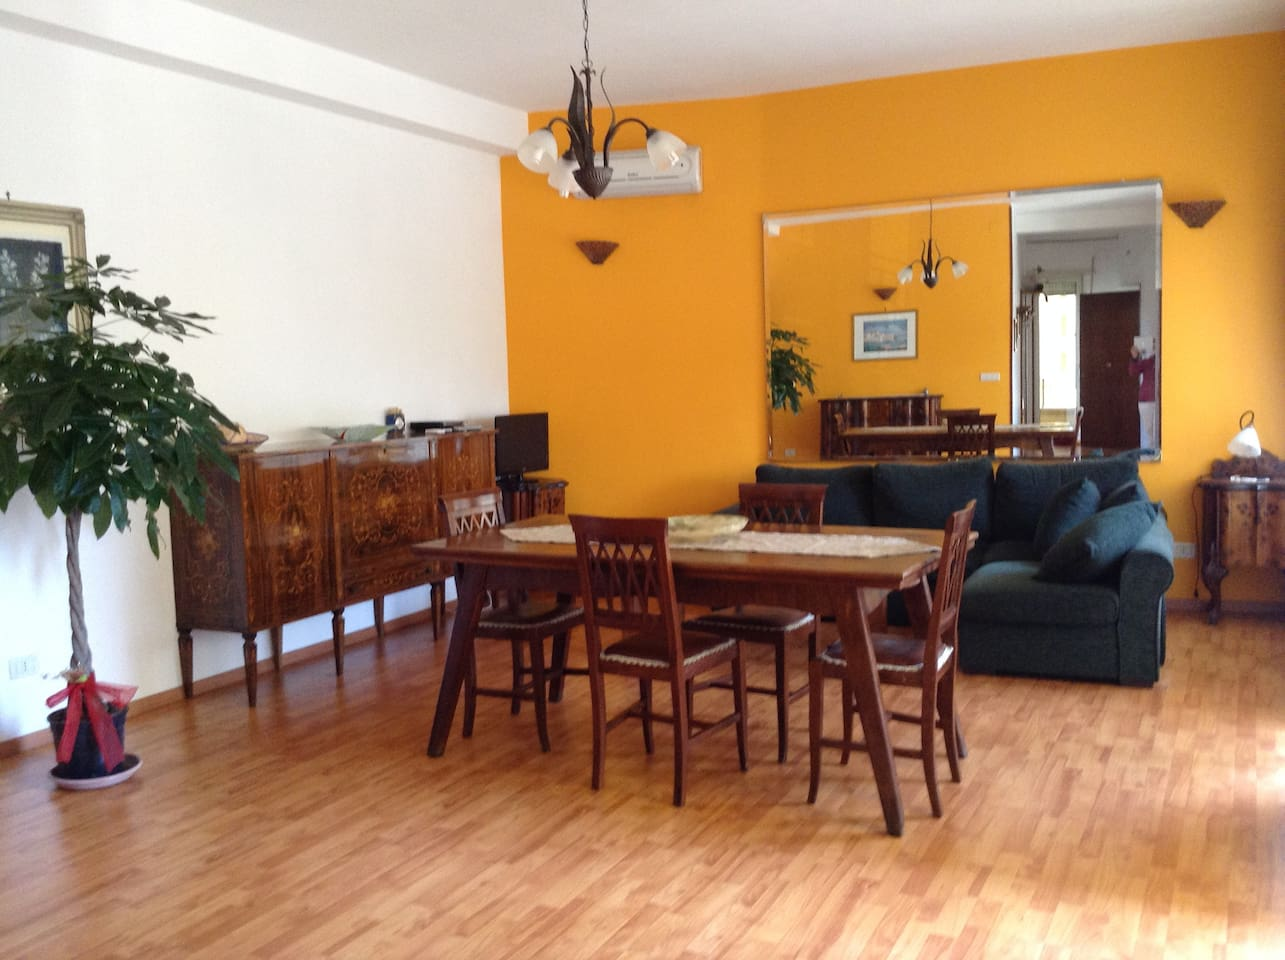 Diningroom with sitting corner